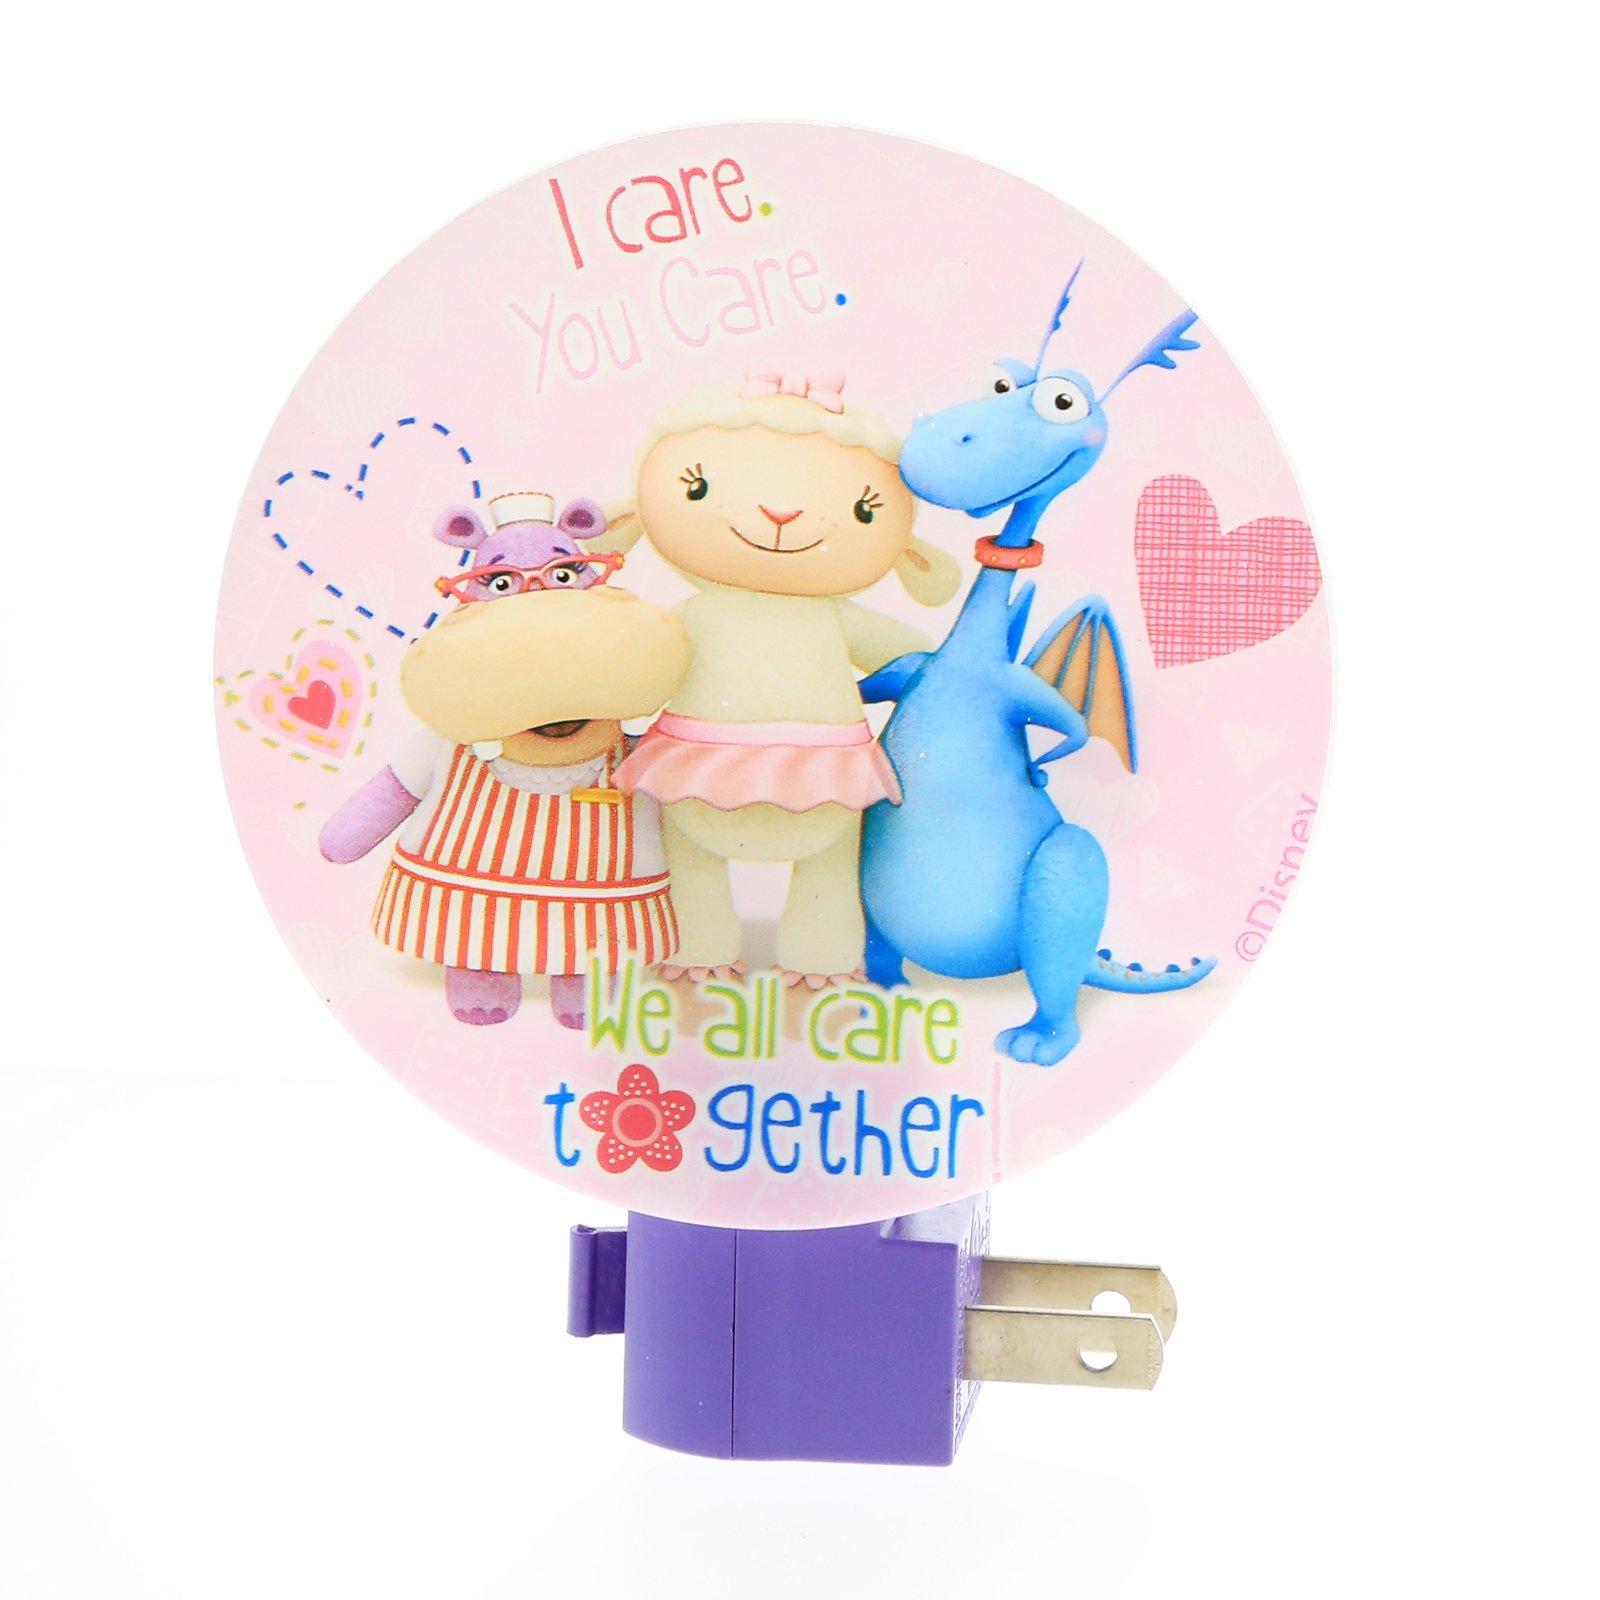 Disney Doc McStuffins Girls Night Light Kids Bedroom Home Decor - Pink